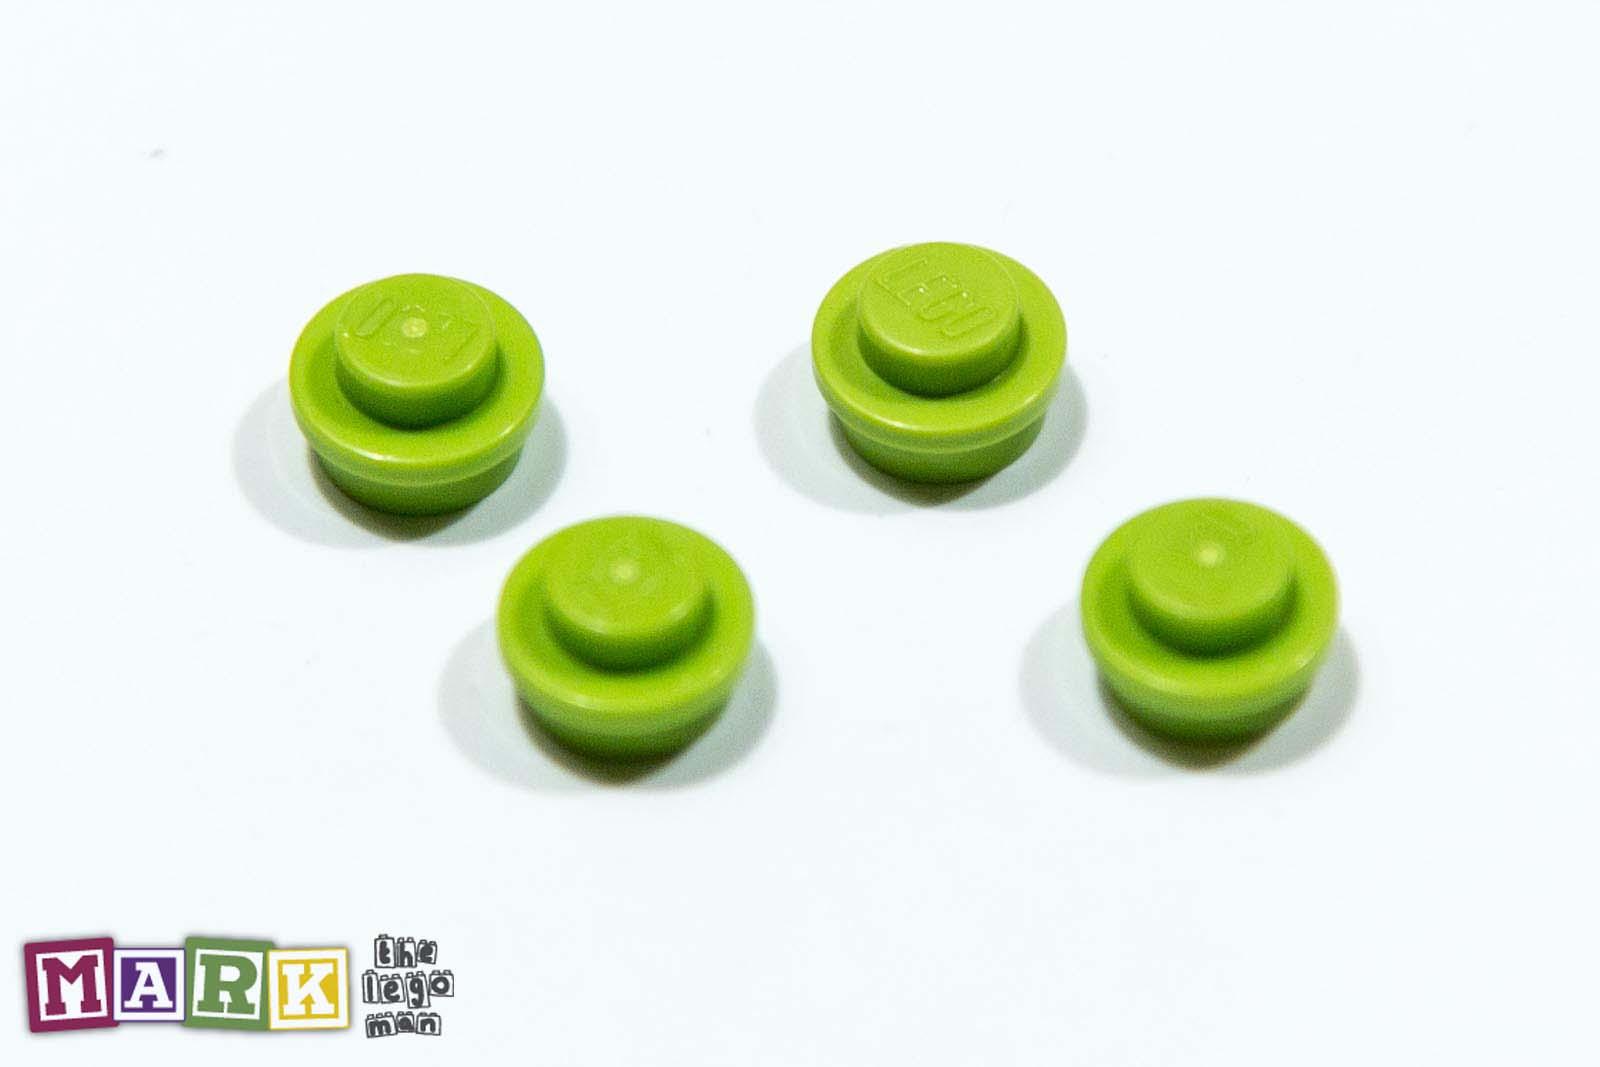 4183133 4073 Job Lot 4x Bright Yellow Green 1x1 RARE Plate Round